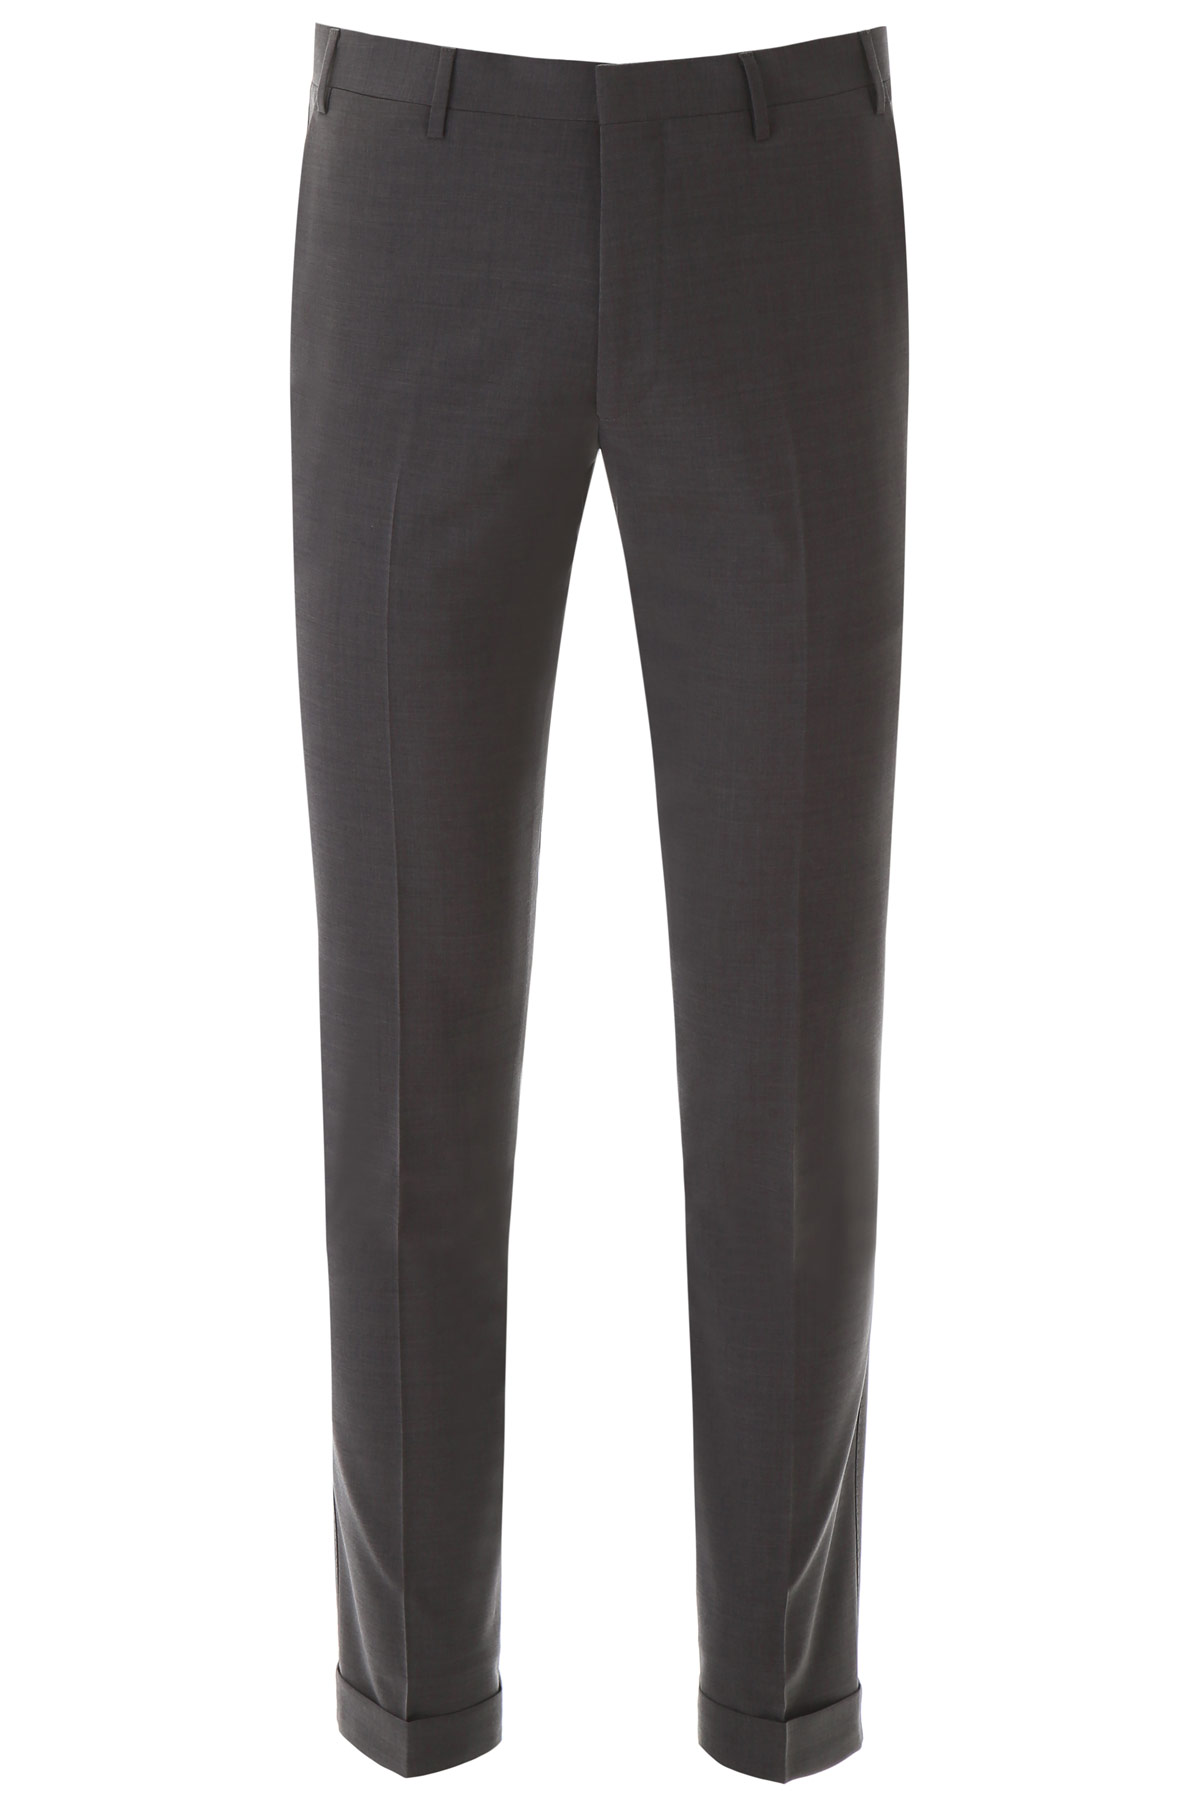 CC COLLECTION CORNELIANI CLASSIC WOOL TROUSERS 54 Grey Wool